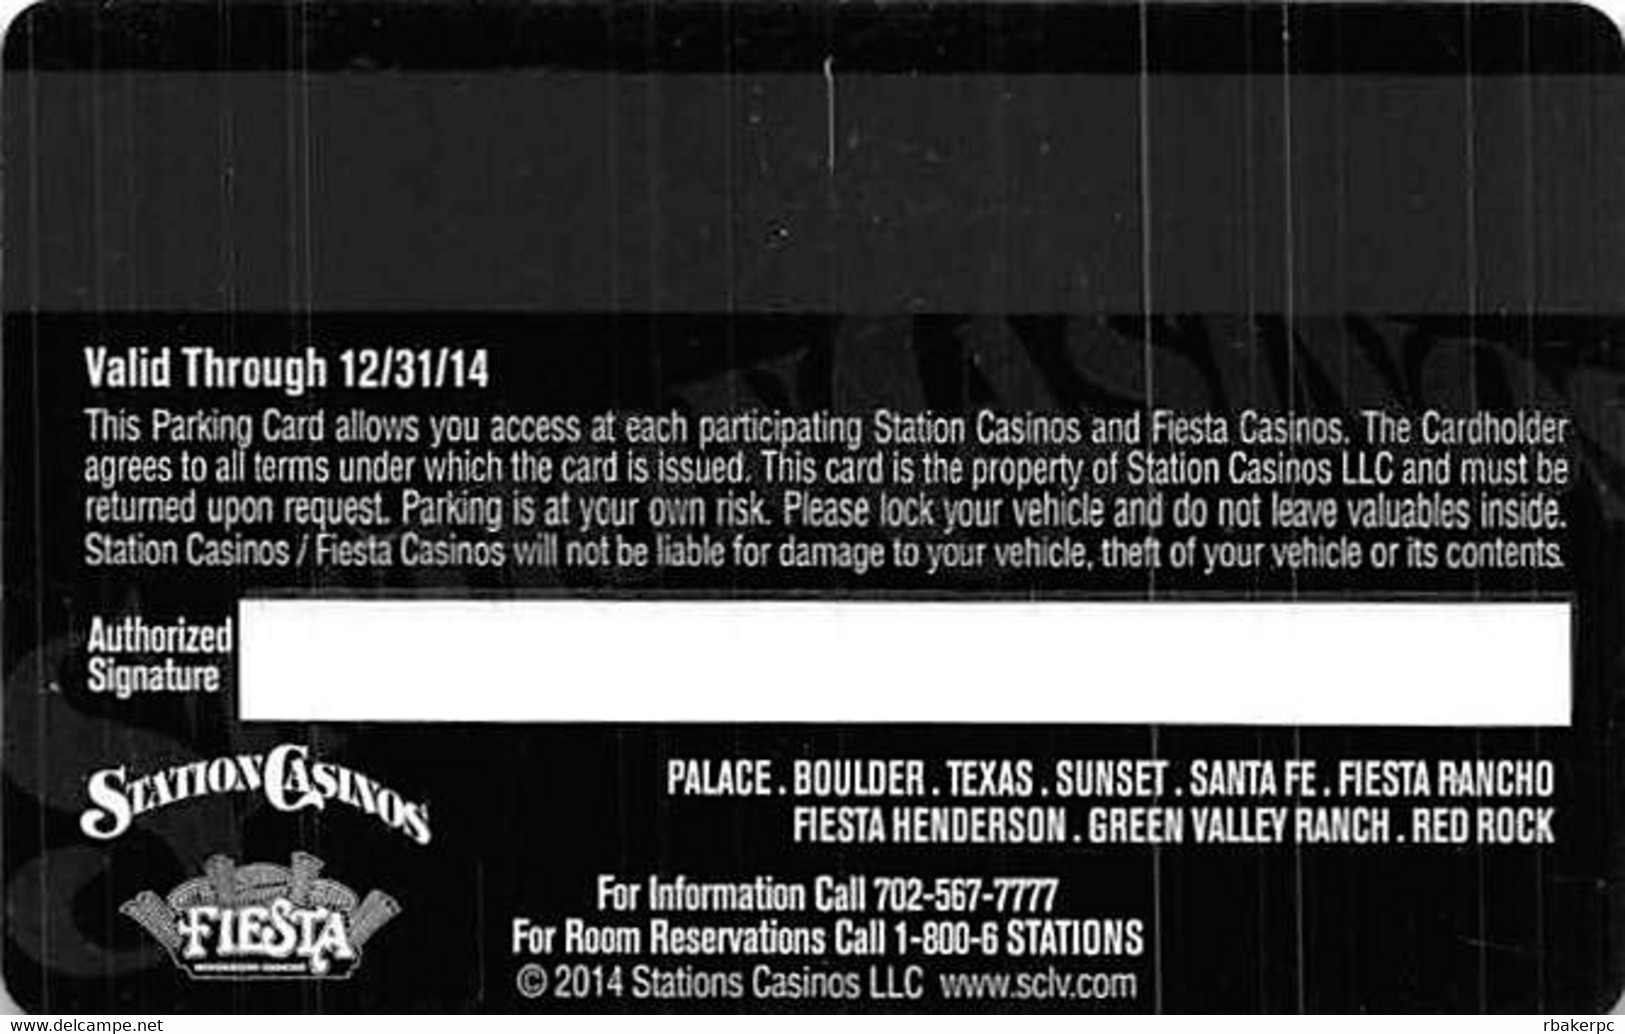 Station Casinos Las Vegas, NV - VIP Parking Card - Copyright 2014 - Exp 12/31/14 - Casino Cards